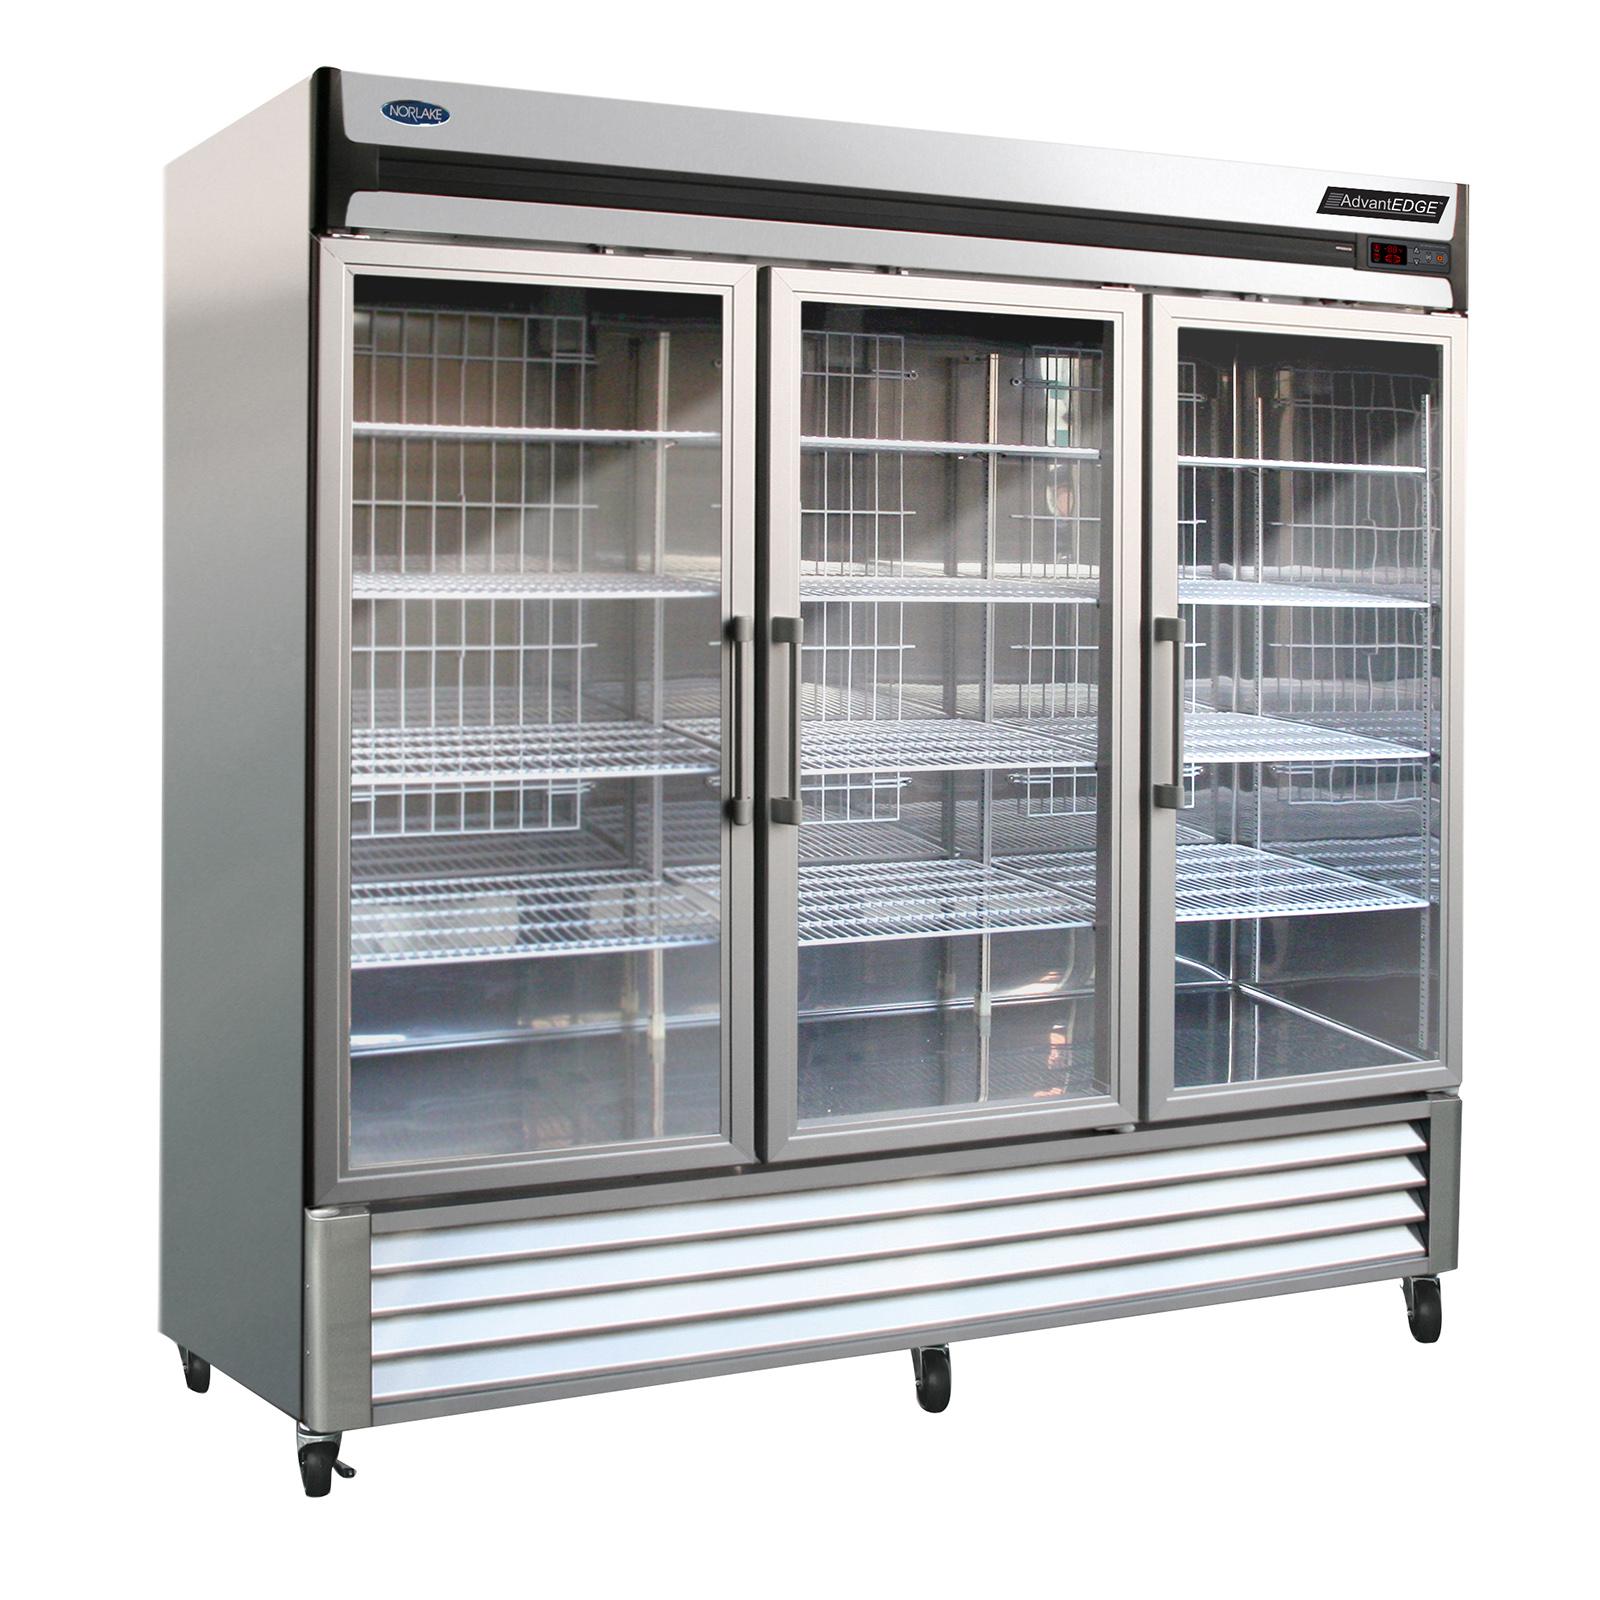 Nor-Lake NLR72-G refrigerator, reach-in